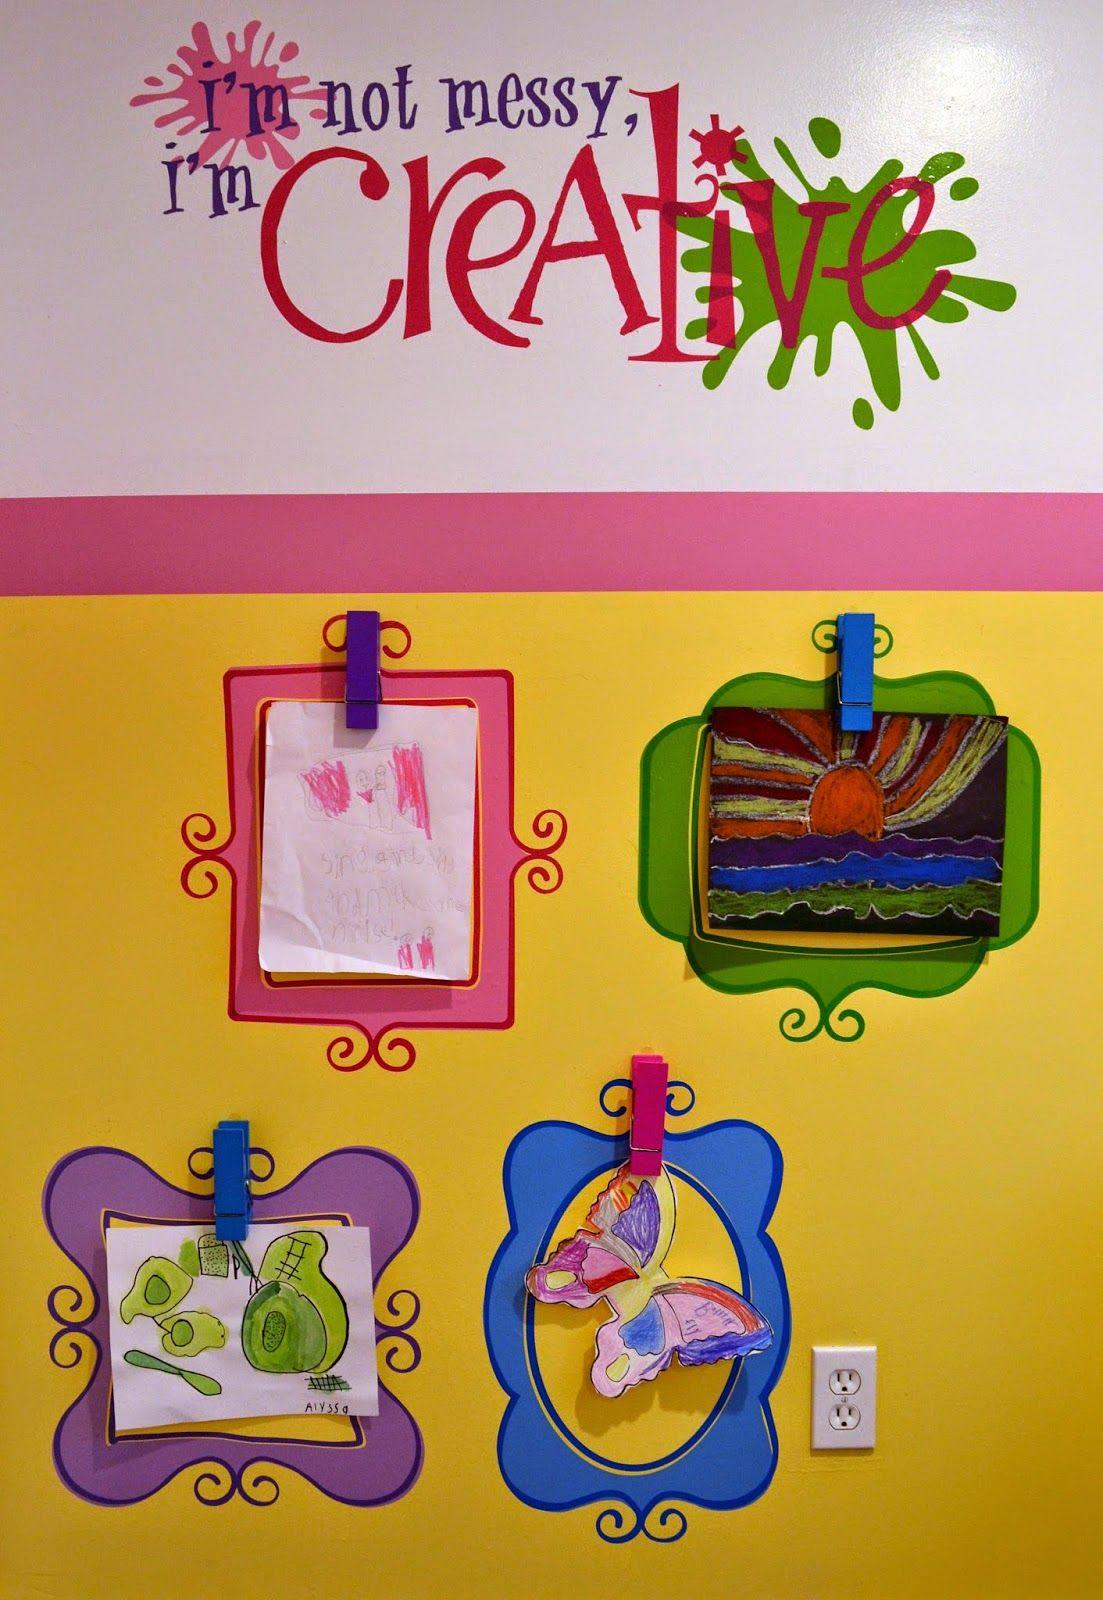 Art Display Wall | Display wall, Display and Silhouettes